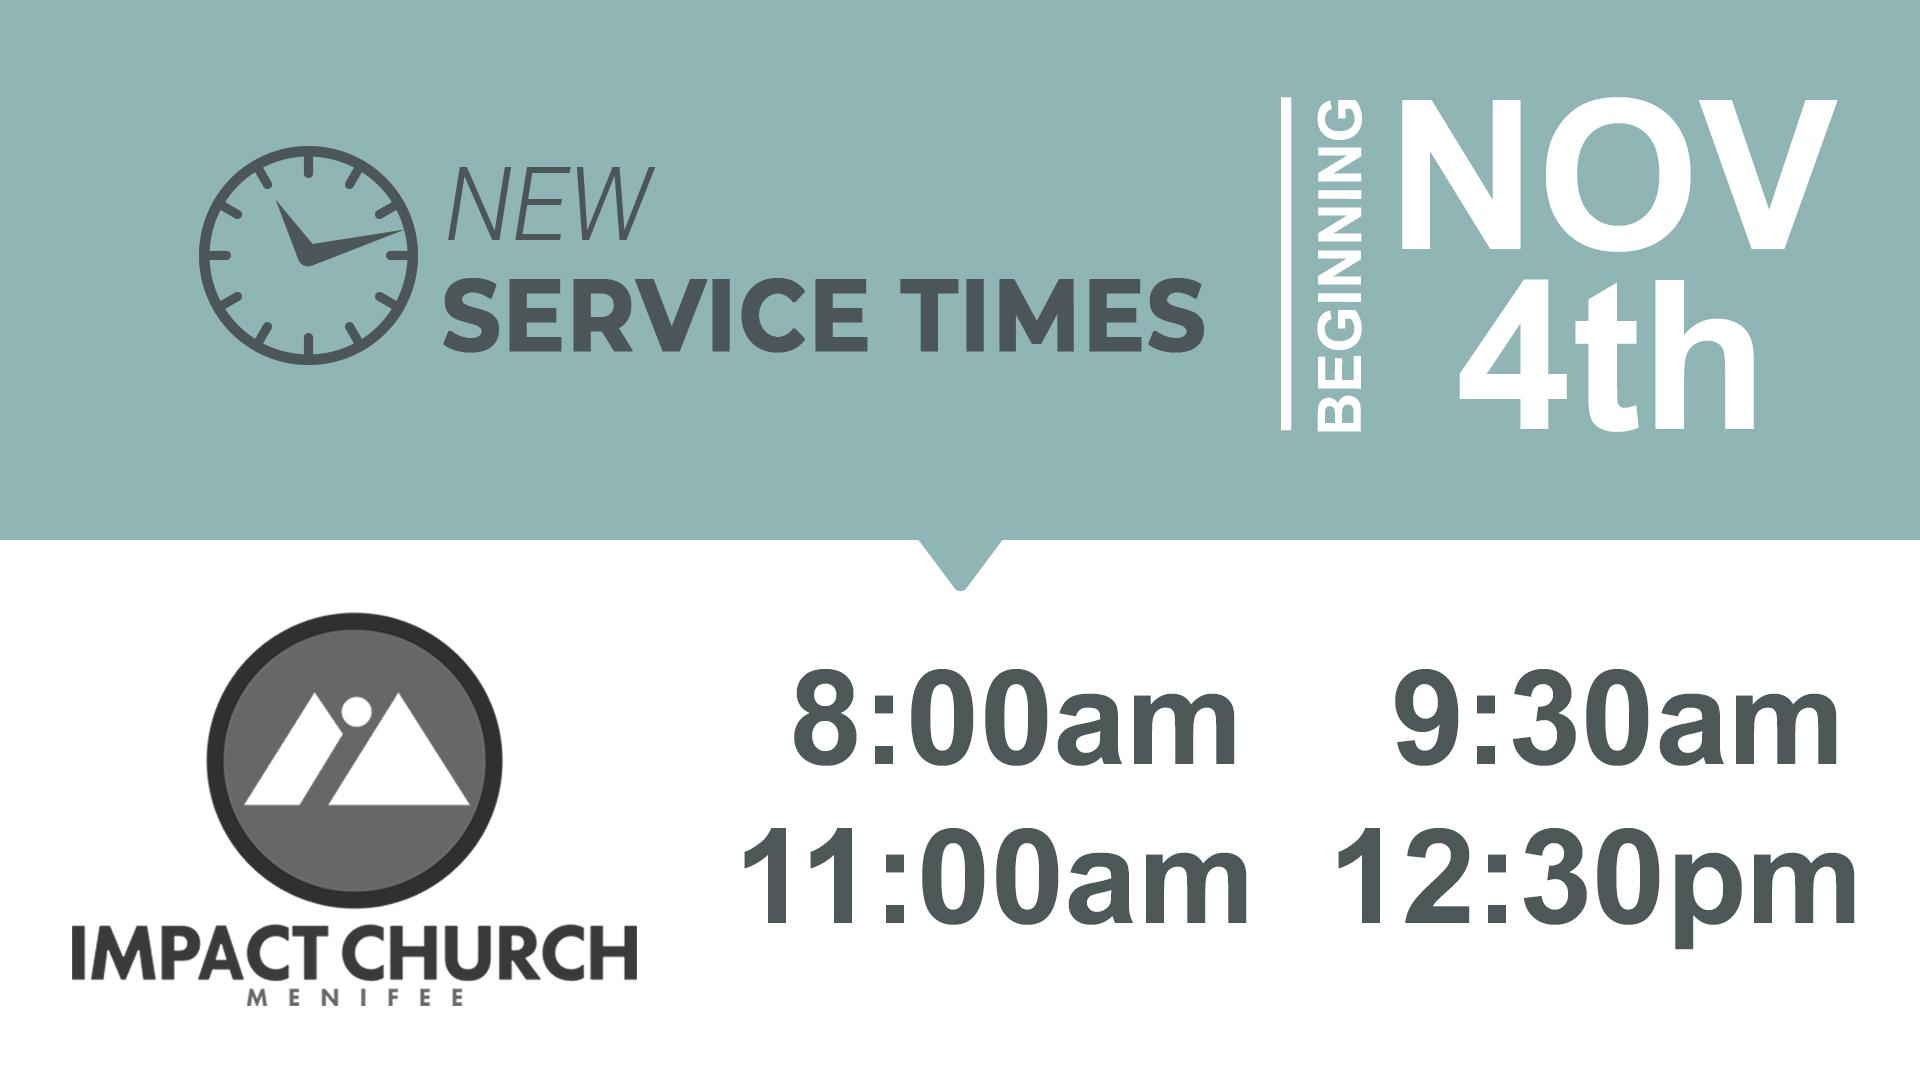 New-Service-Times-Nov-4th.jpg